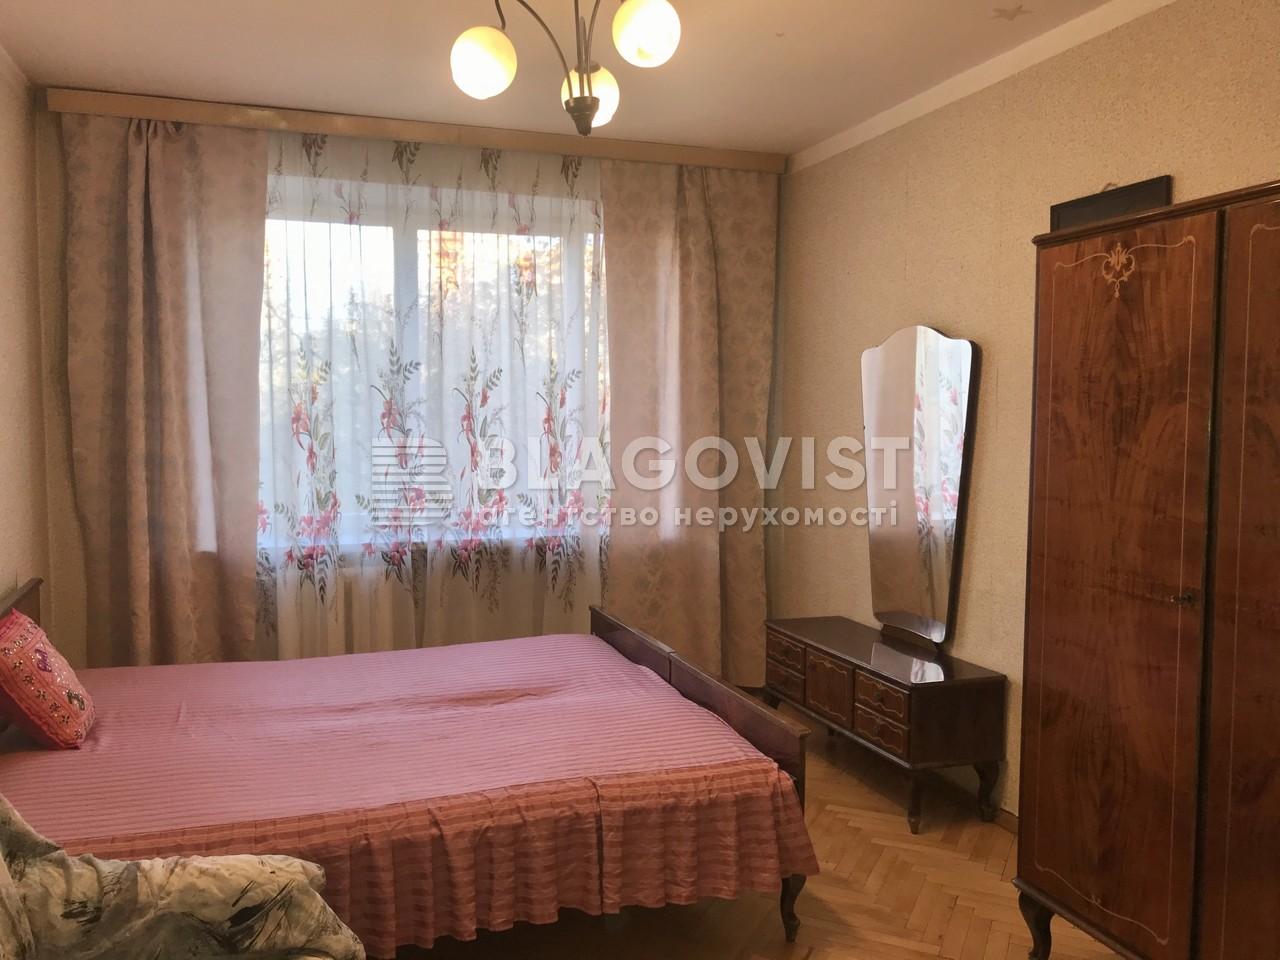 Квартира F-42448, Тургеневская, 70-72, Киев - Фото 6